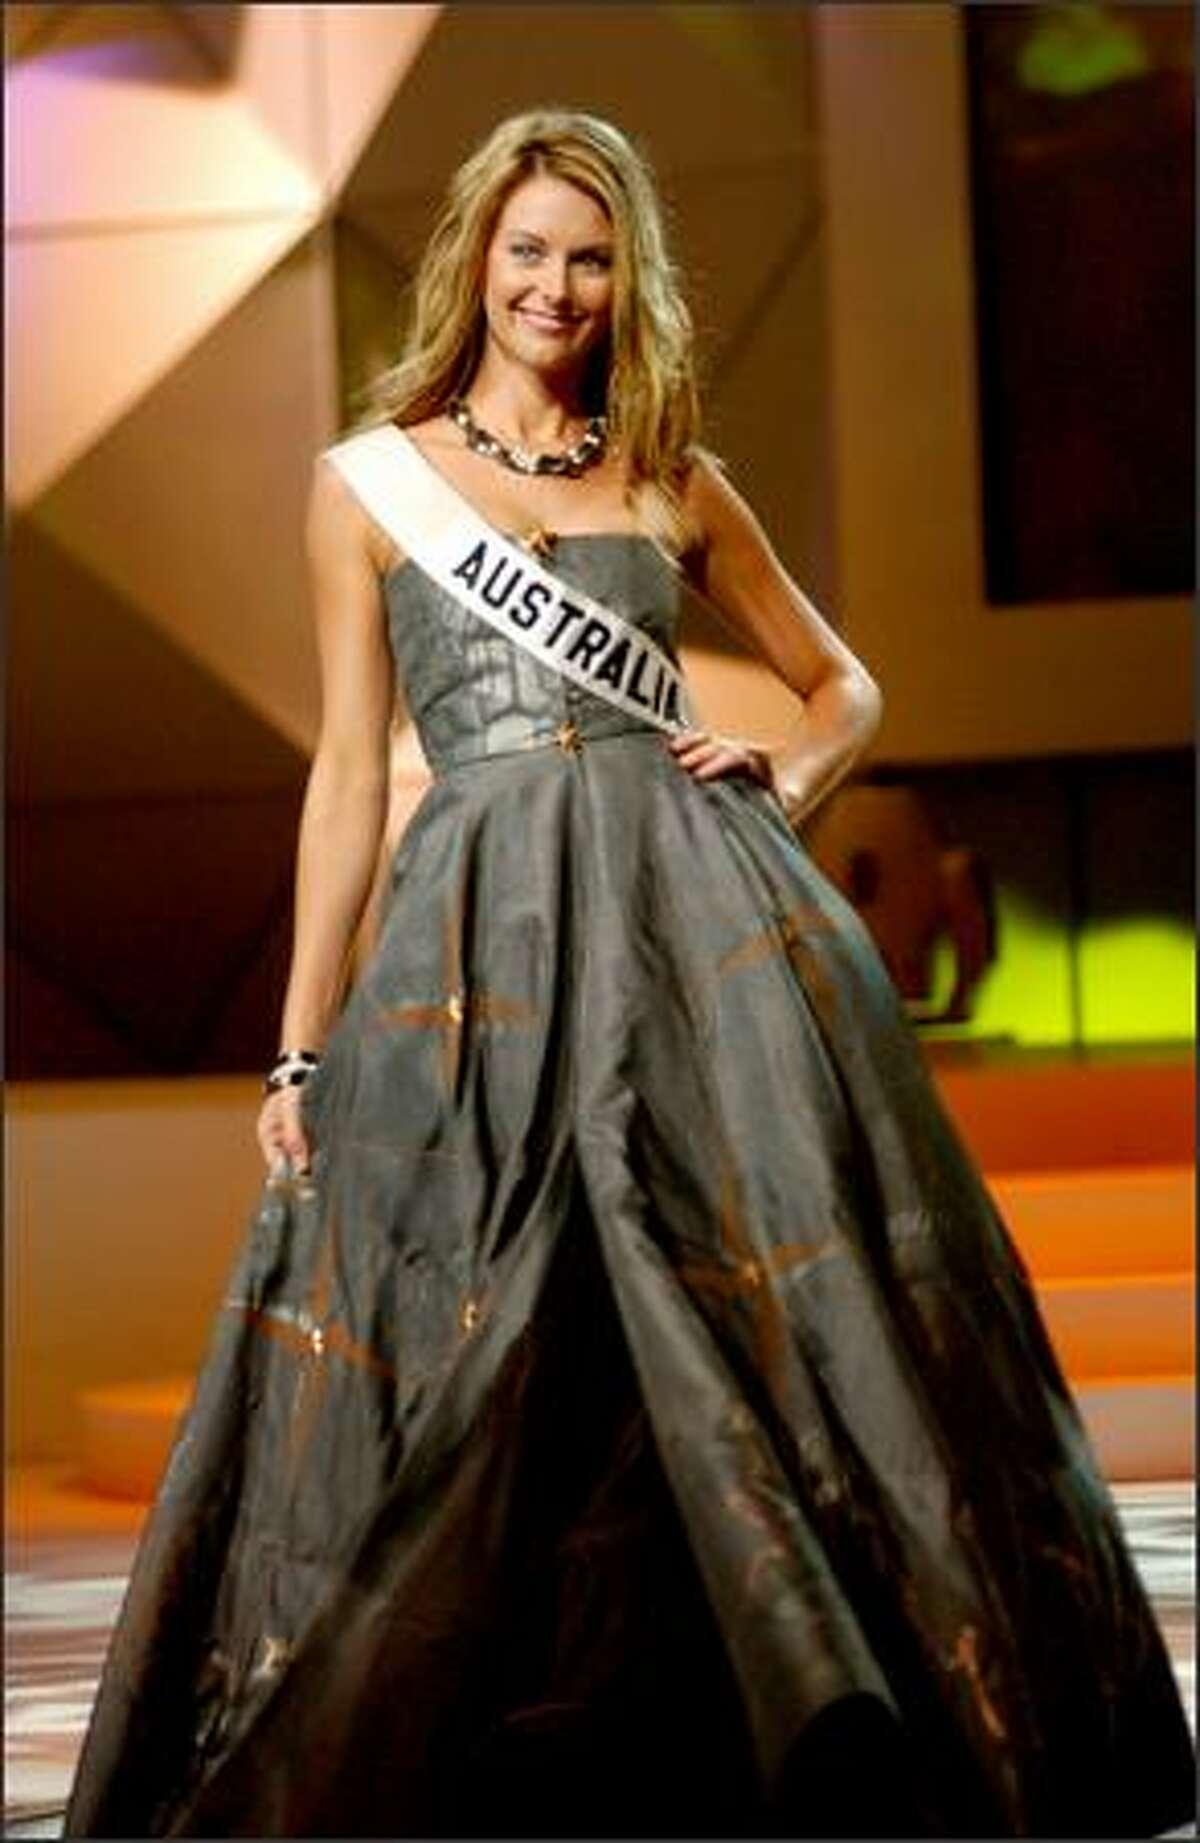 Jennifer Hawkins, Miss Australia, participates in the 2004 Miss Universe National Costume Show at the Casa de la Cultura in Quito, Ecuador.